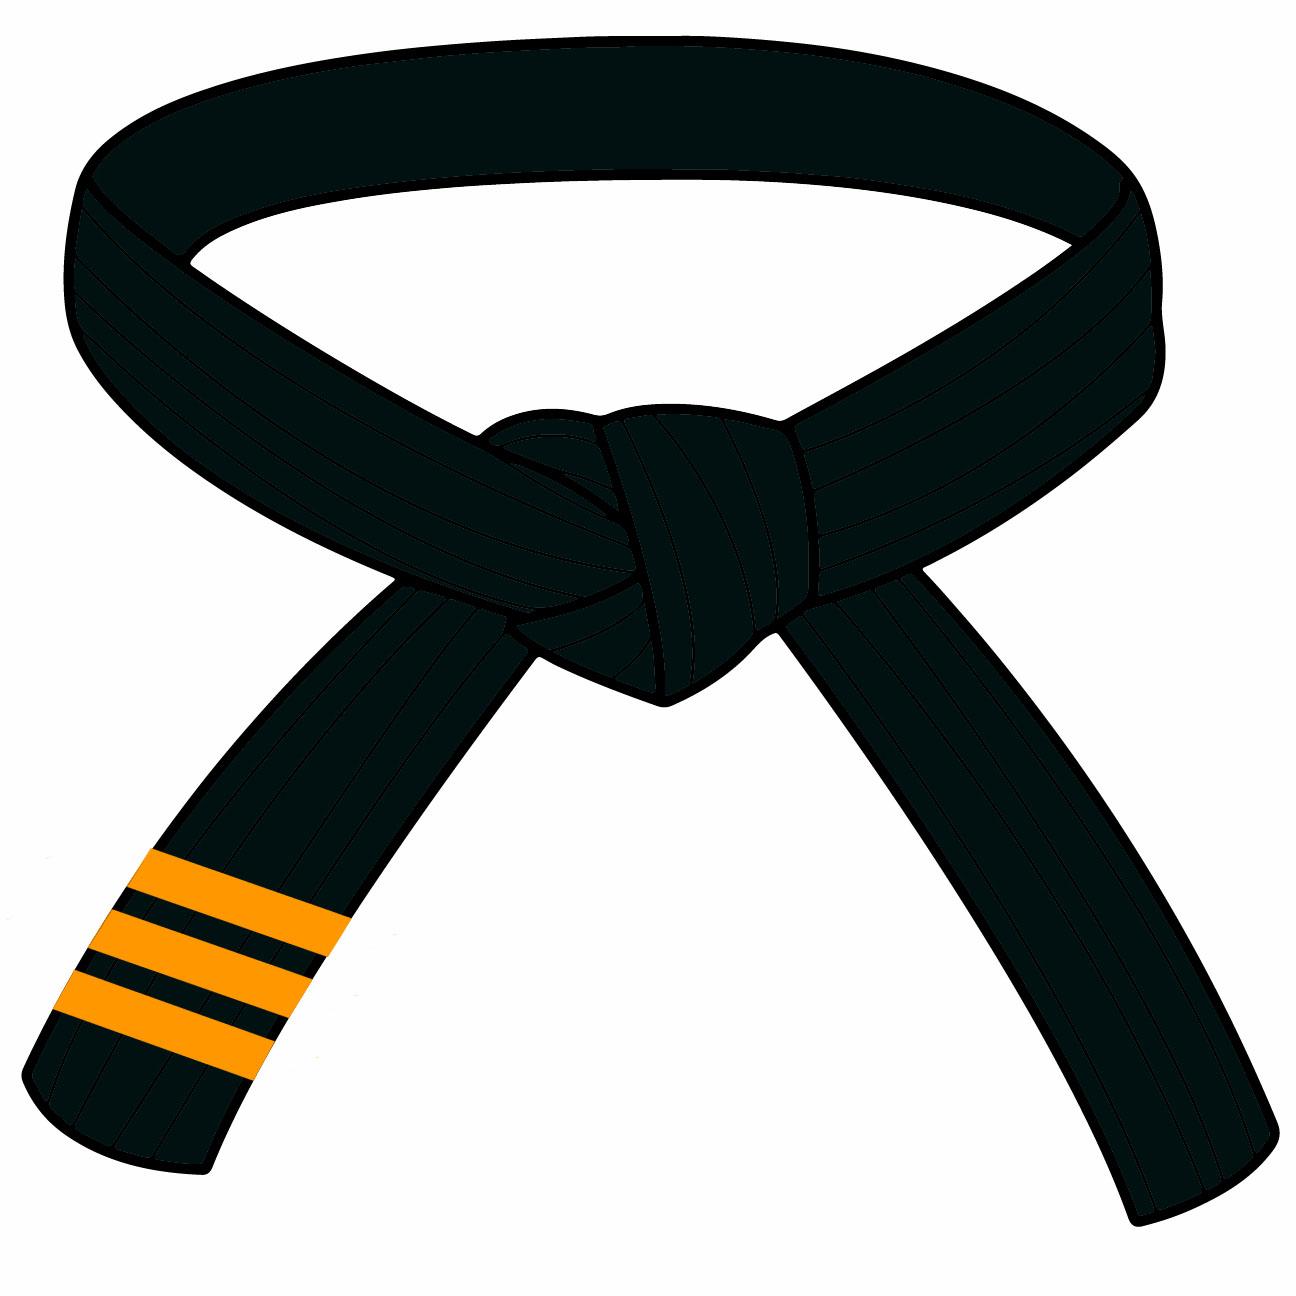 Belt clipart karate. Black curriculum national additional